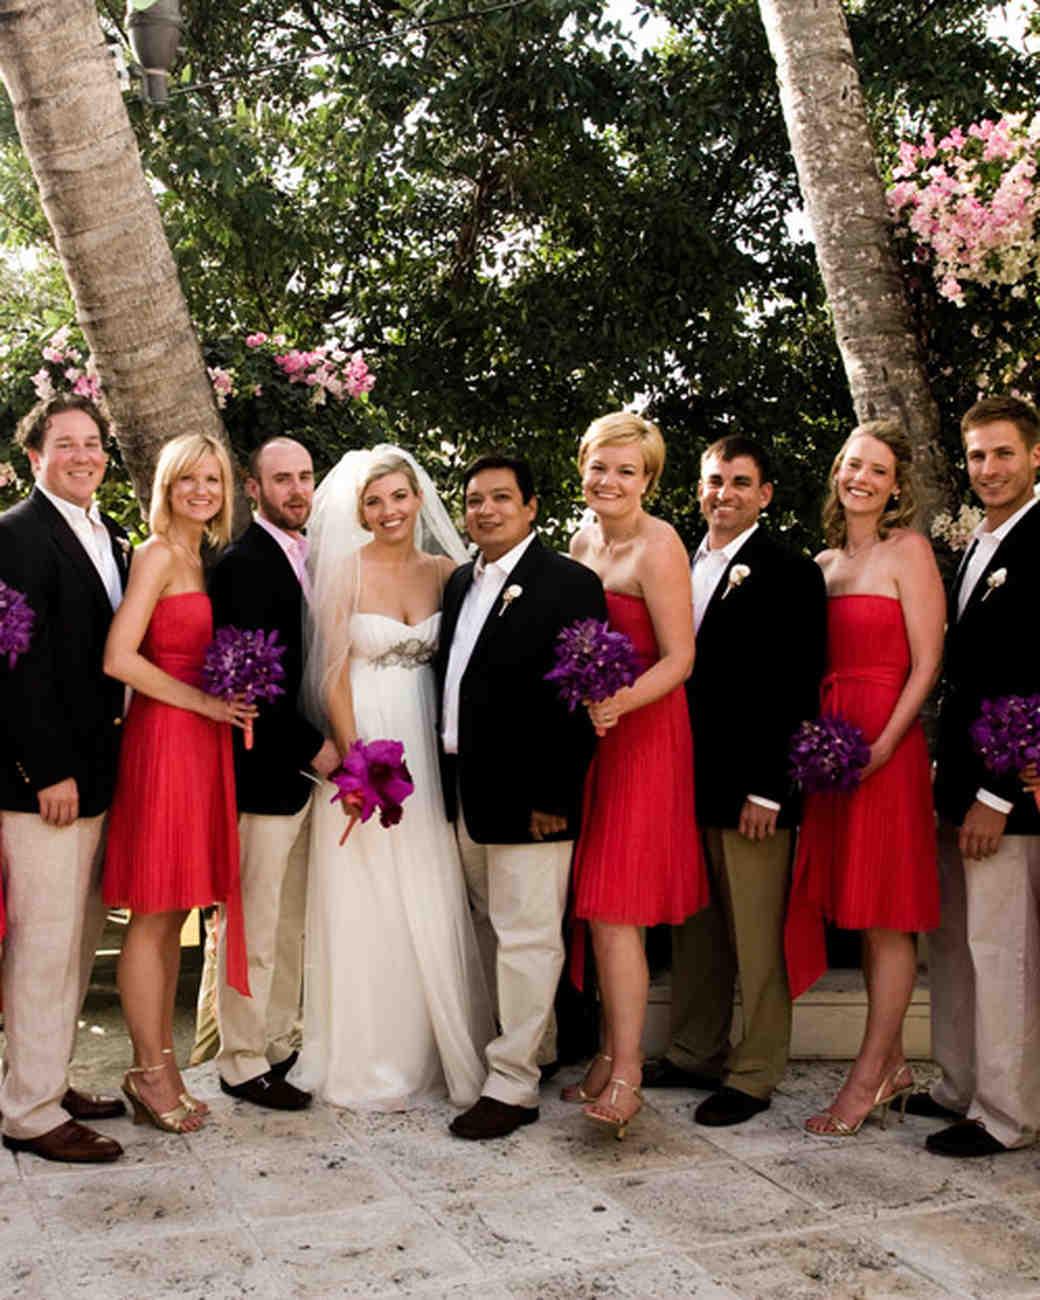 msw_travel09_bridal_party_bahamas.jpg